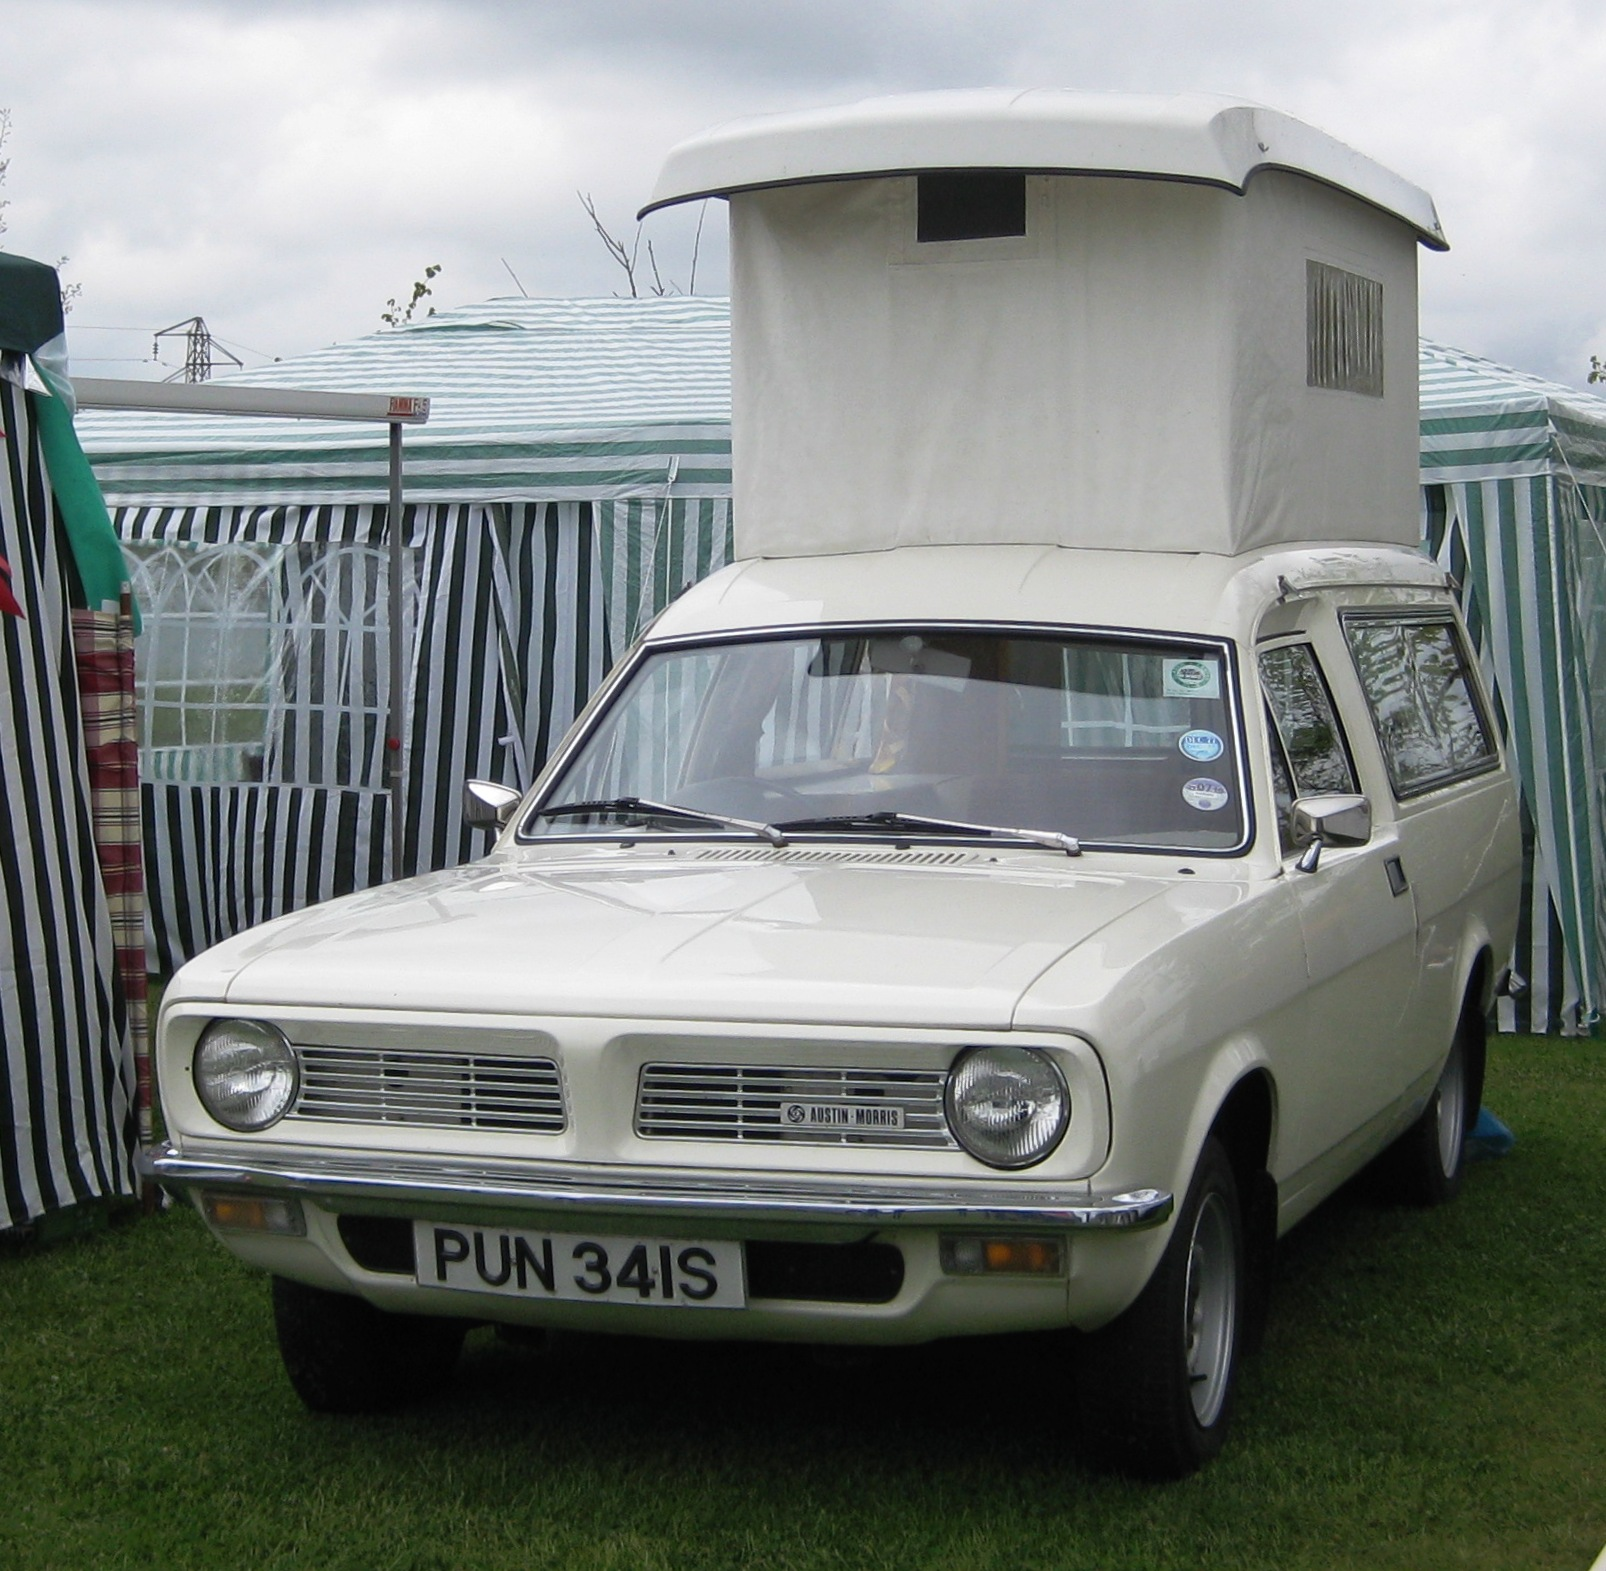 Austin-Morris Marina Motor caravan at Battlesbridge.JPG